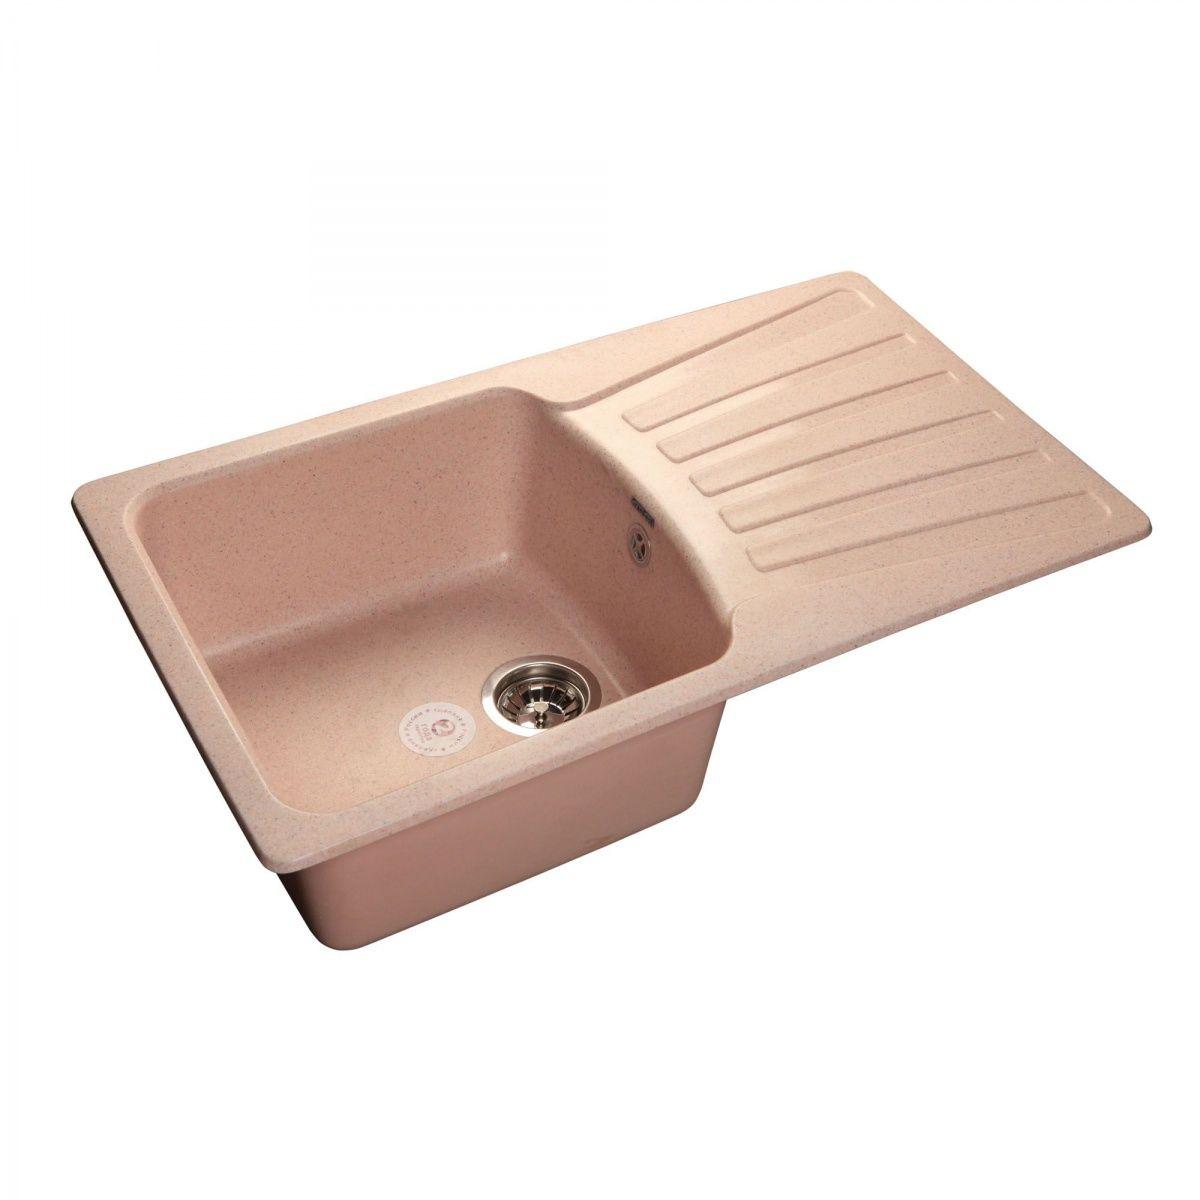 Фото - Кухонная мойка GranFest STANDART GF-S850L чаша+крыло 850*495мм светло-розовый